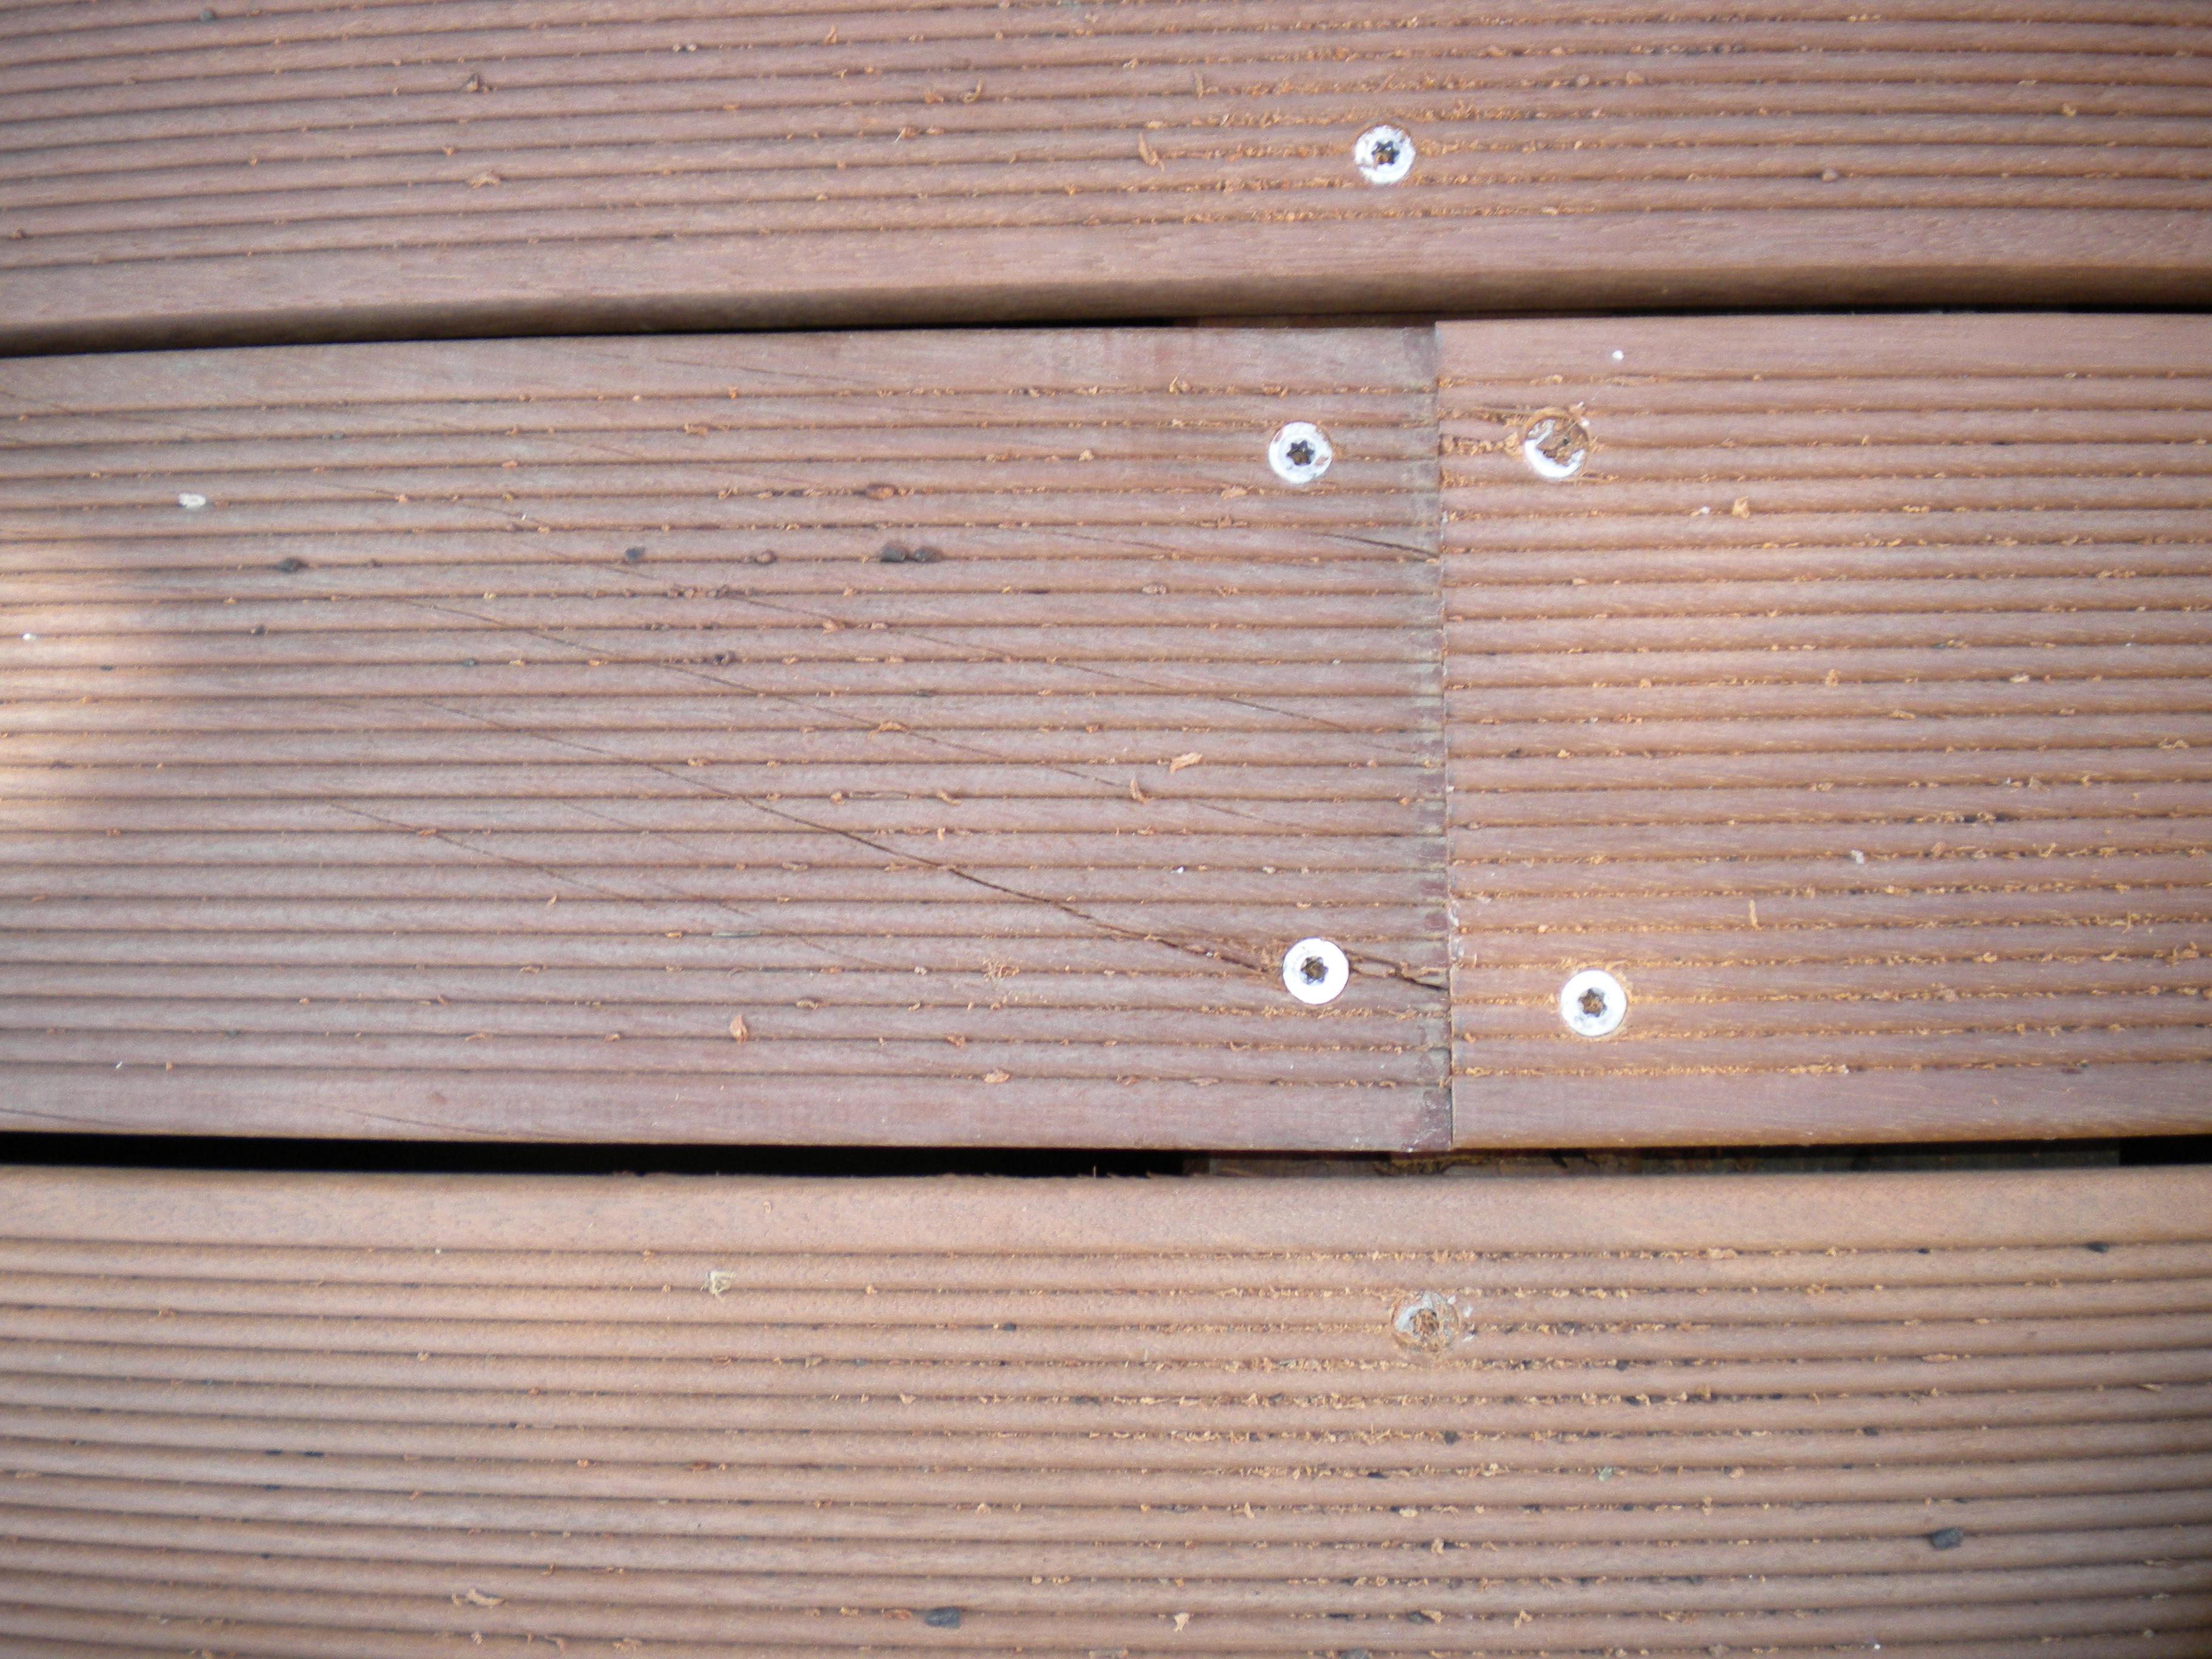 Deck-uri lemn - Uxi SELVA FLOORS - Poza 13